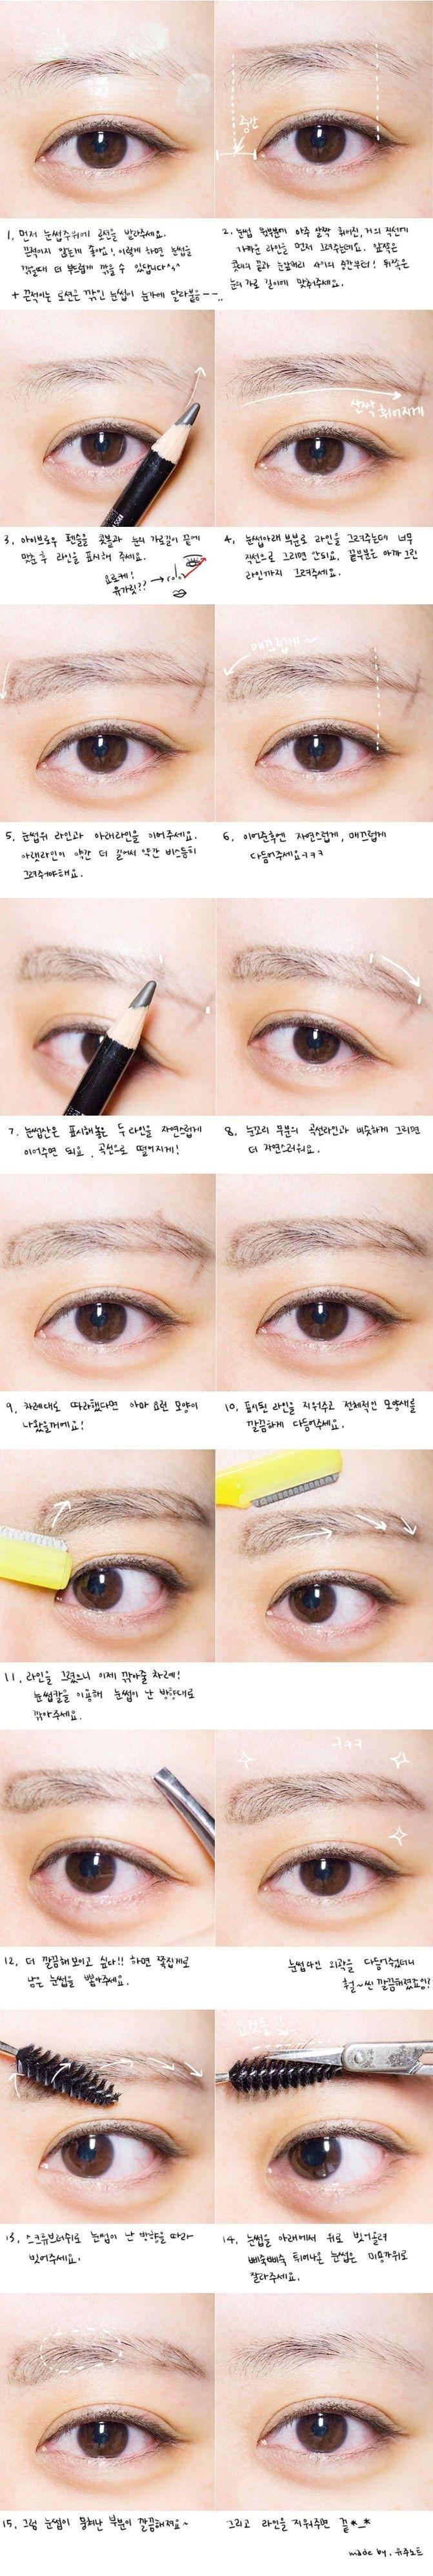 How to groom Korean eyebrows   Monolid Make-up Tutorial ...